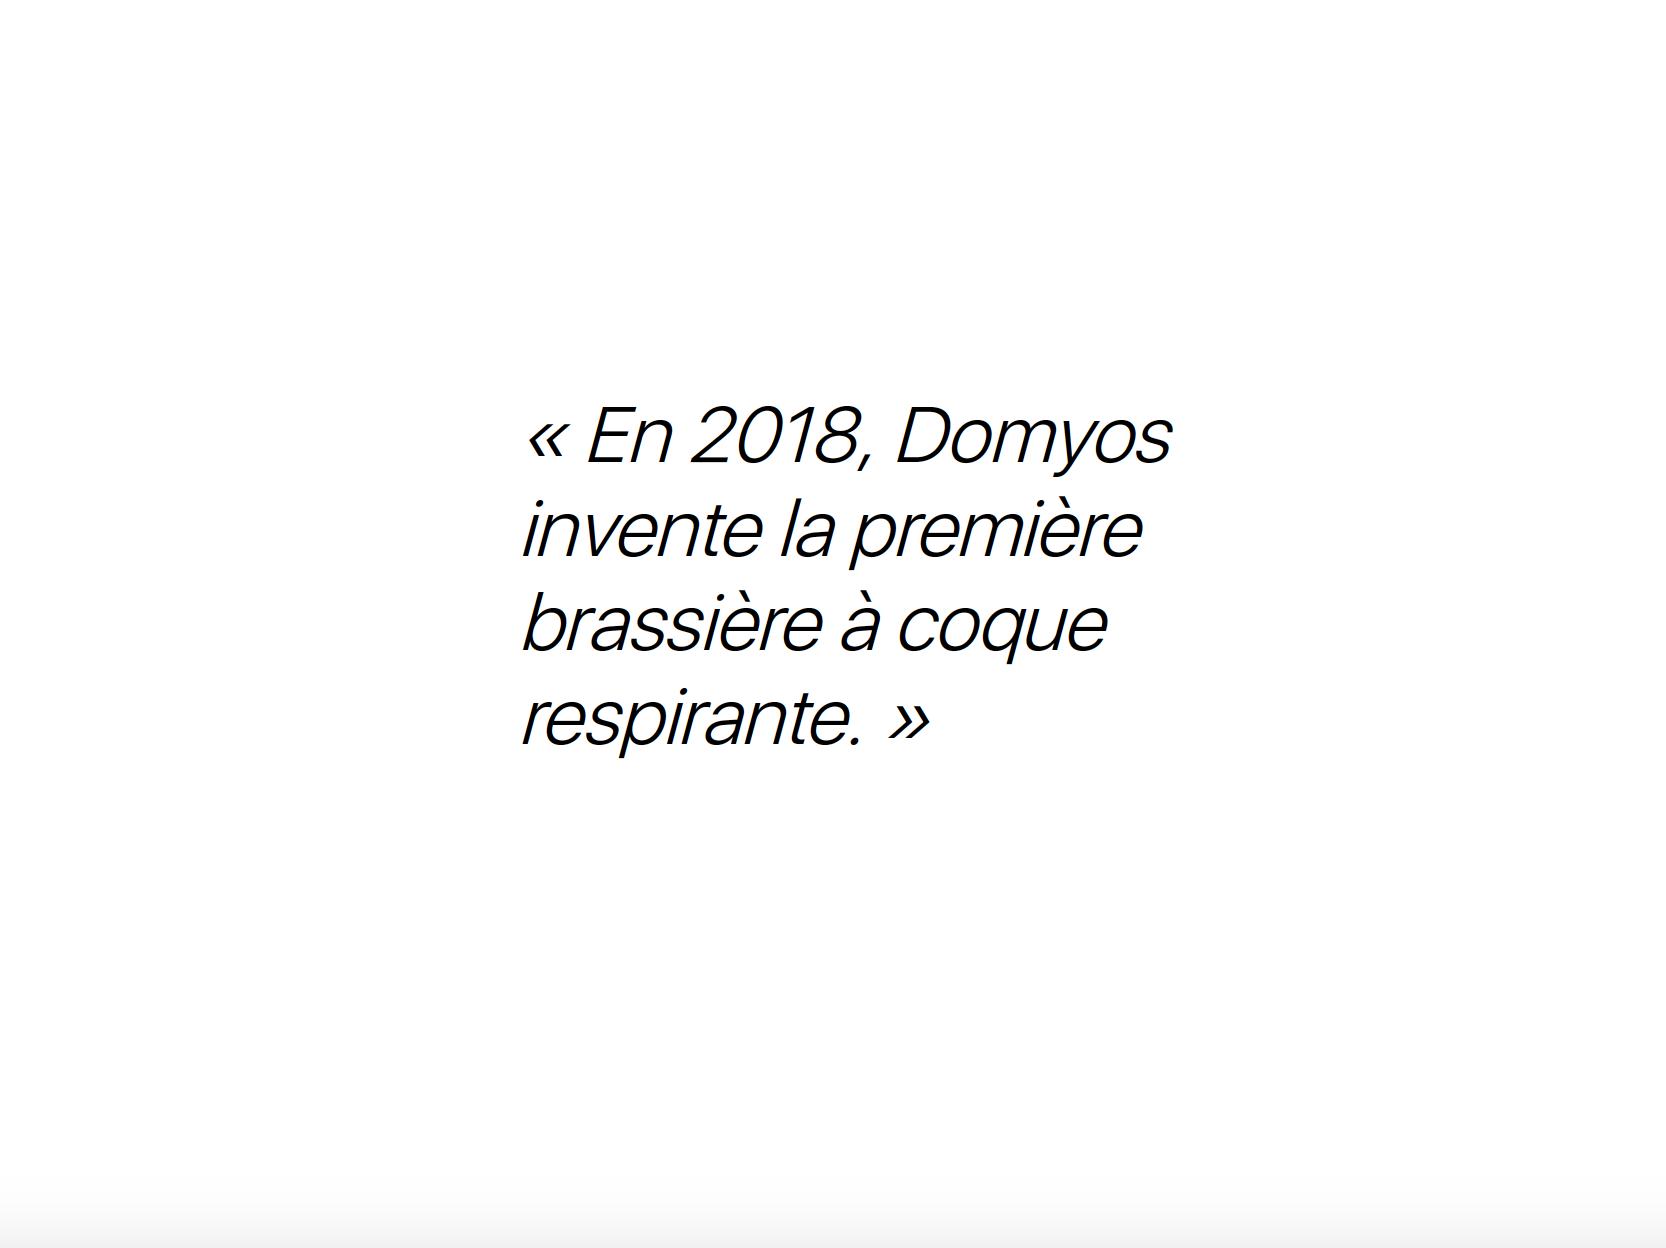 agence activation marketing Domyos Paris Lille 16